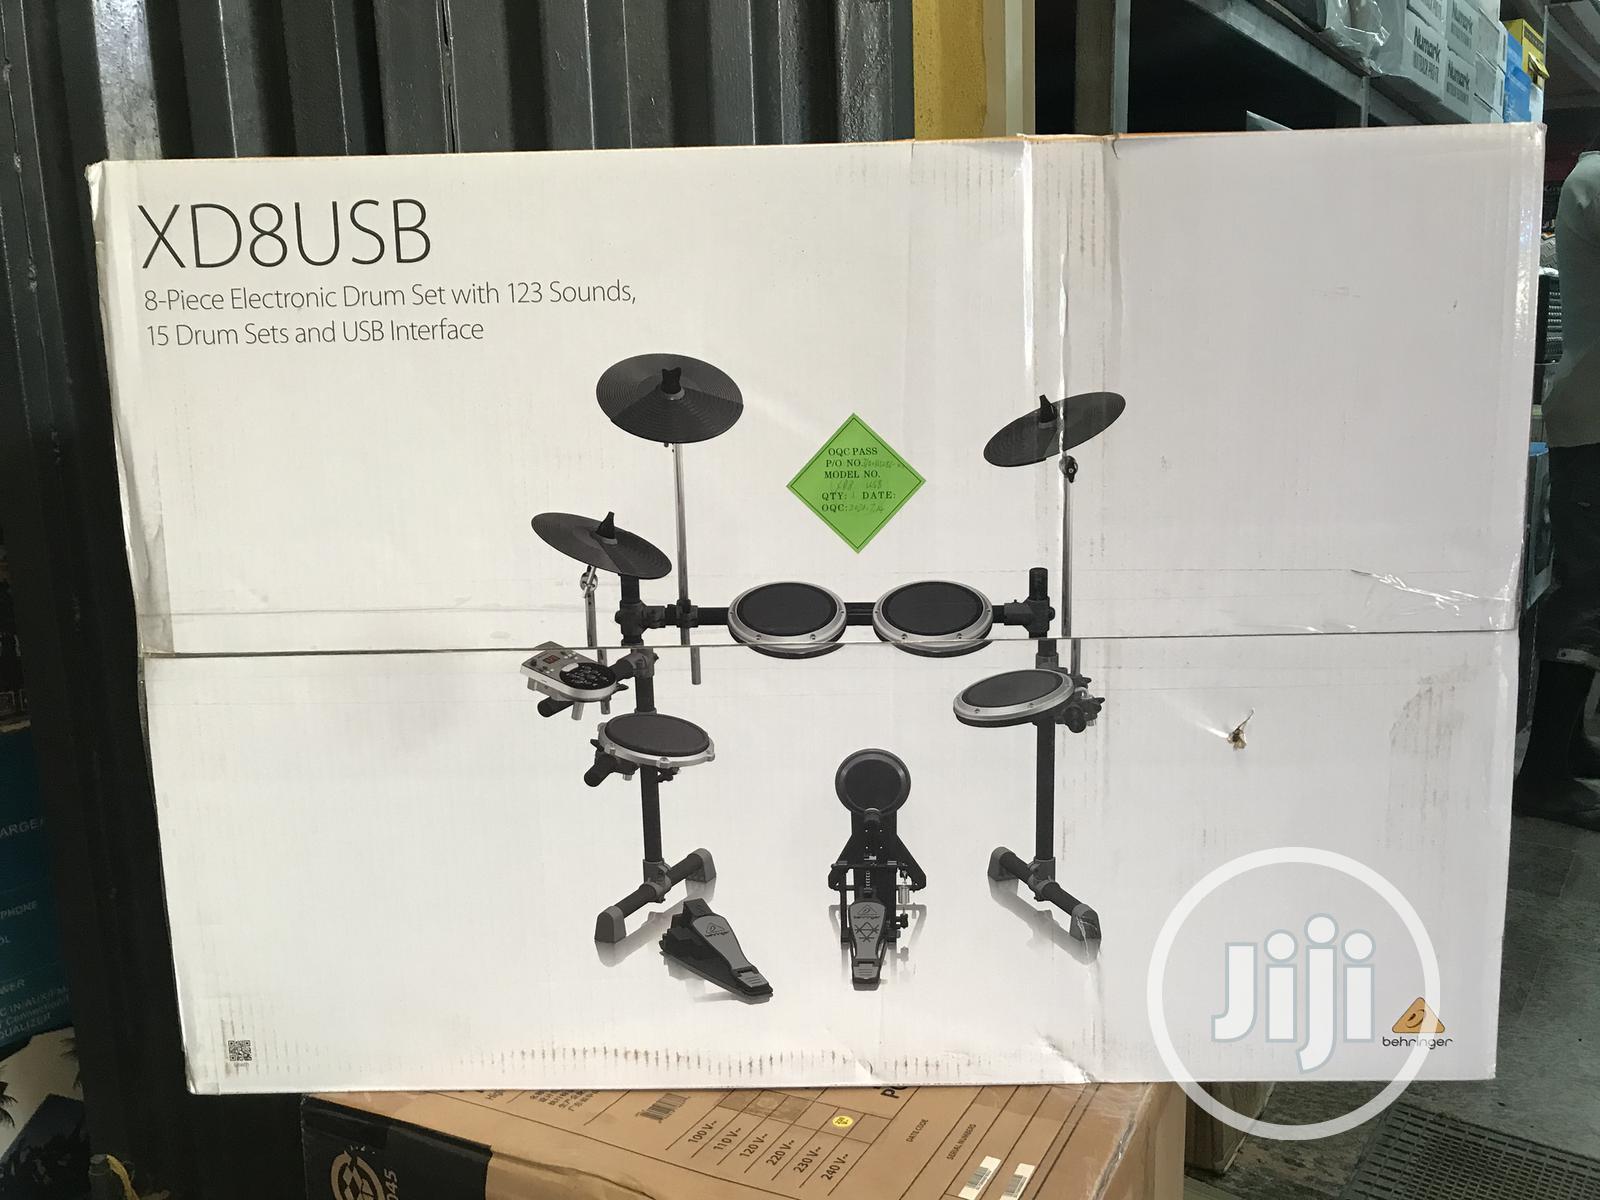 XD8 USD Electrnic Drum